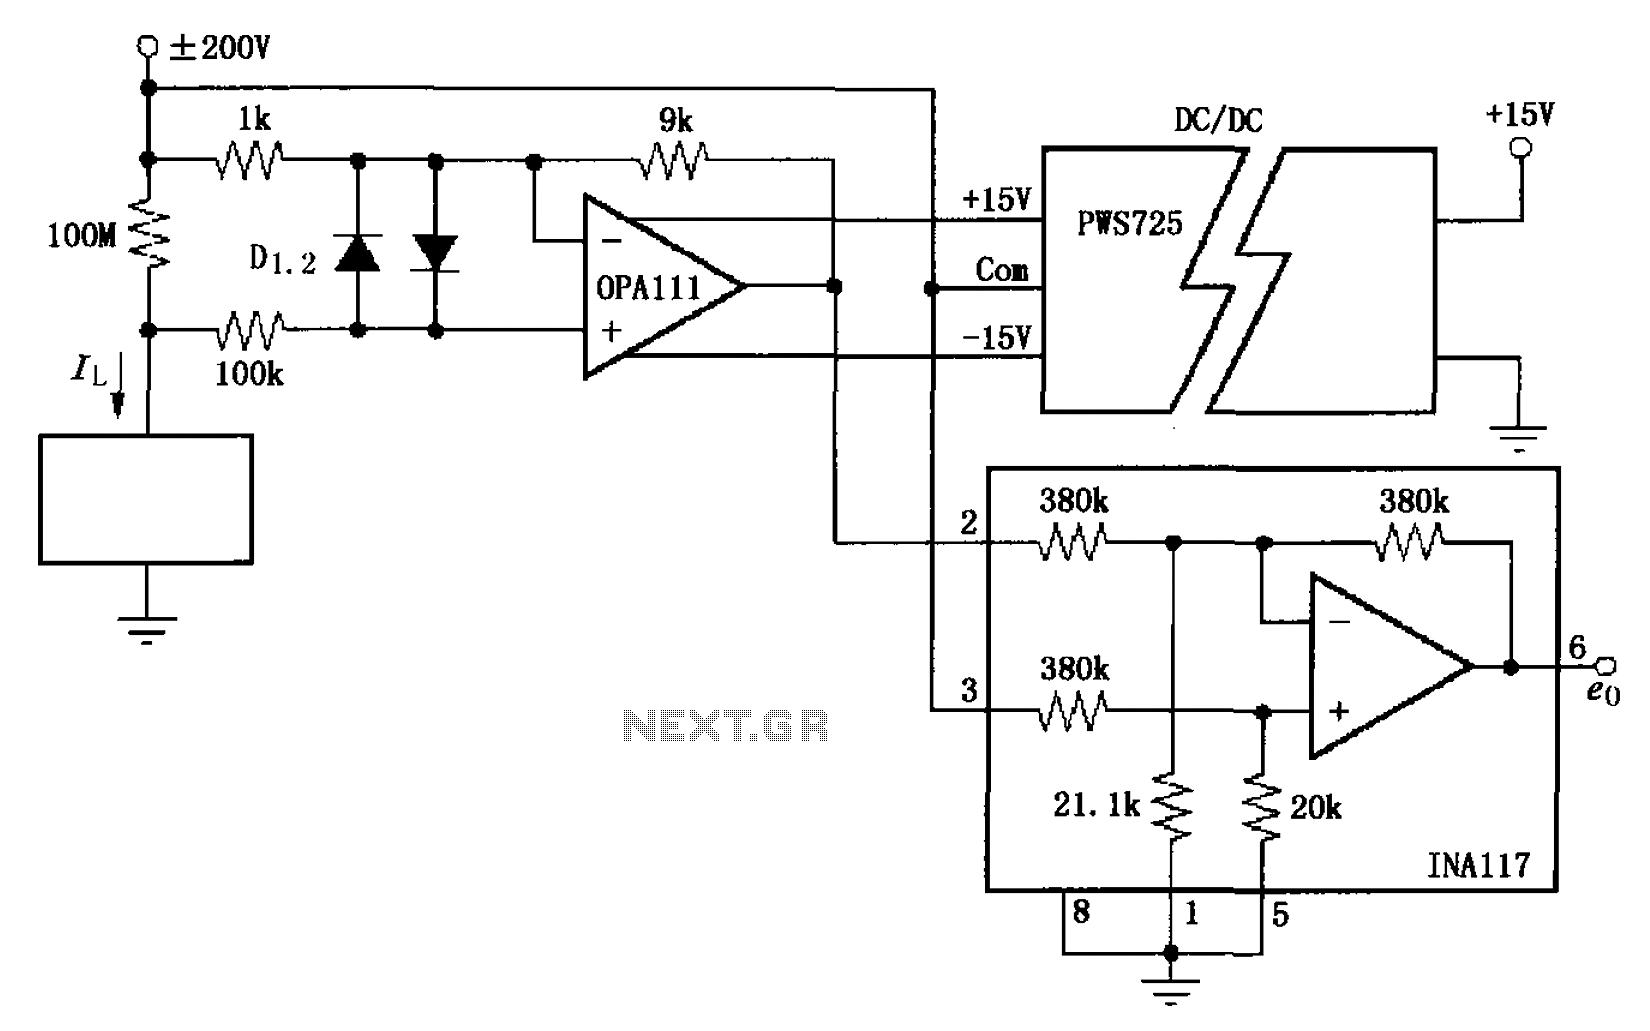 buffer leakage current measurement circuit diagram opa111